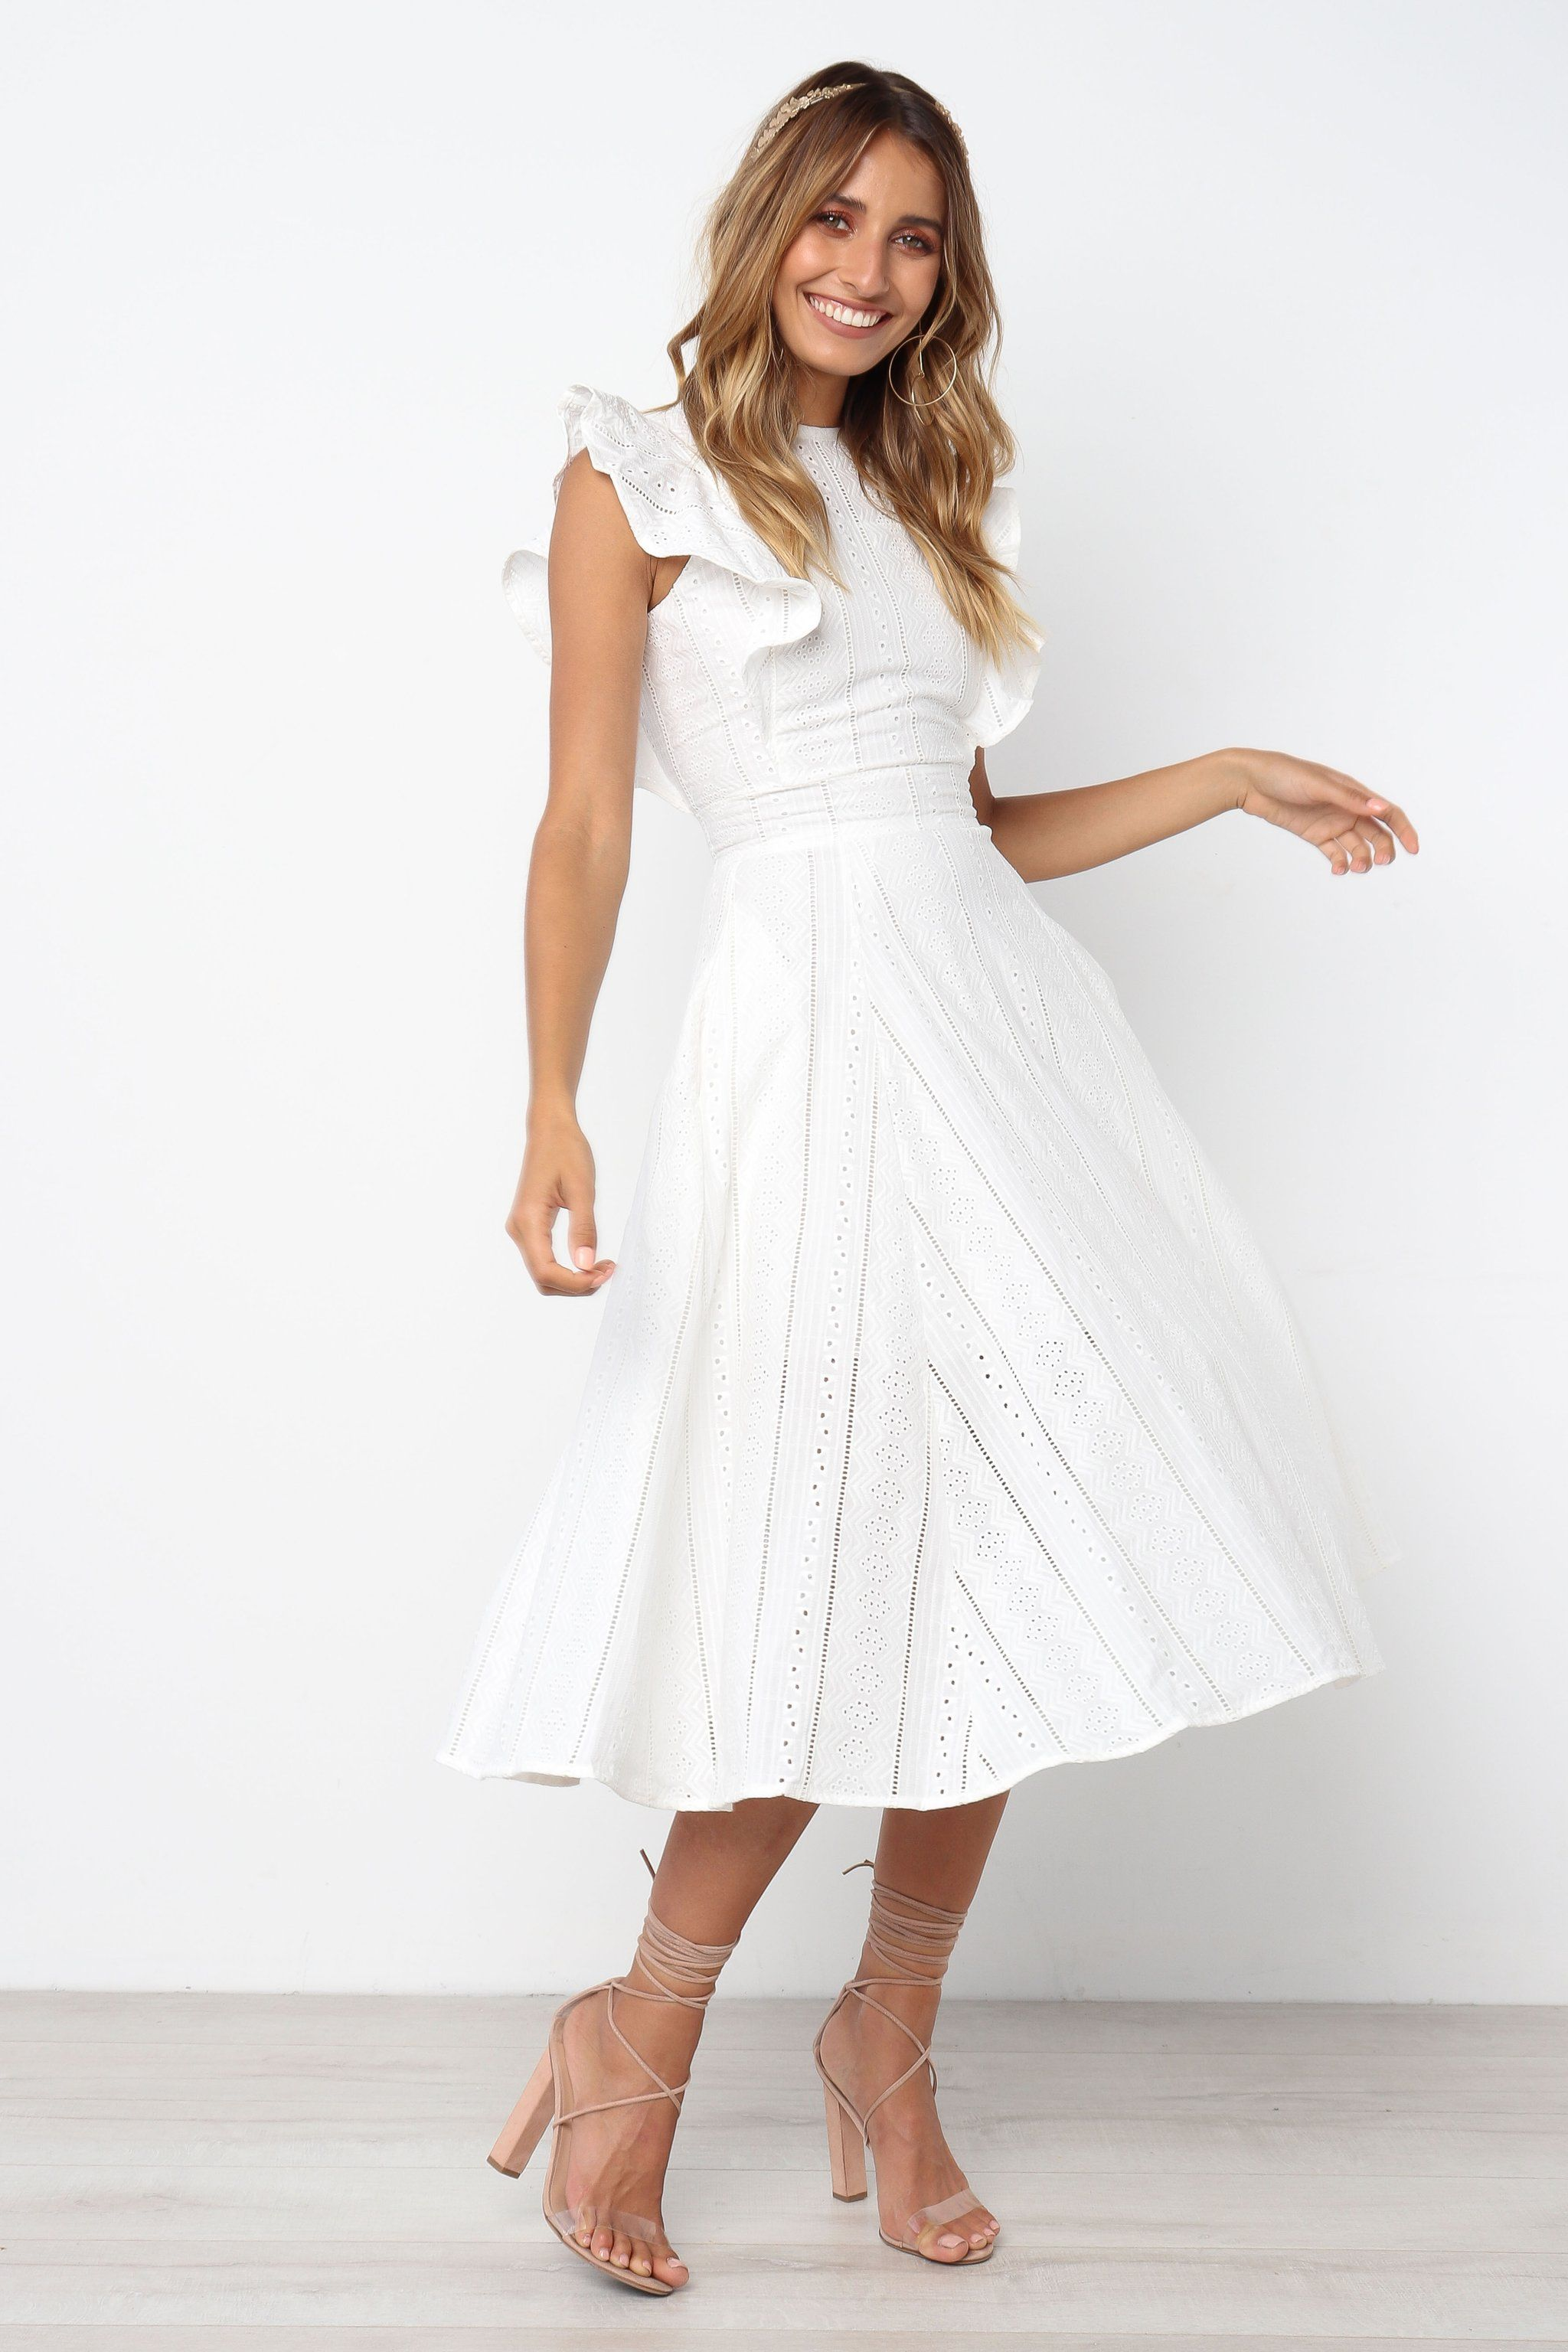 Hart dress white white dress lace white dress dresses